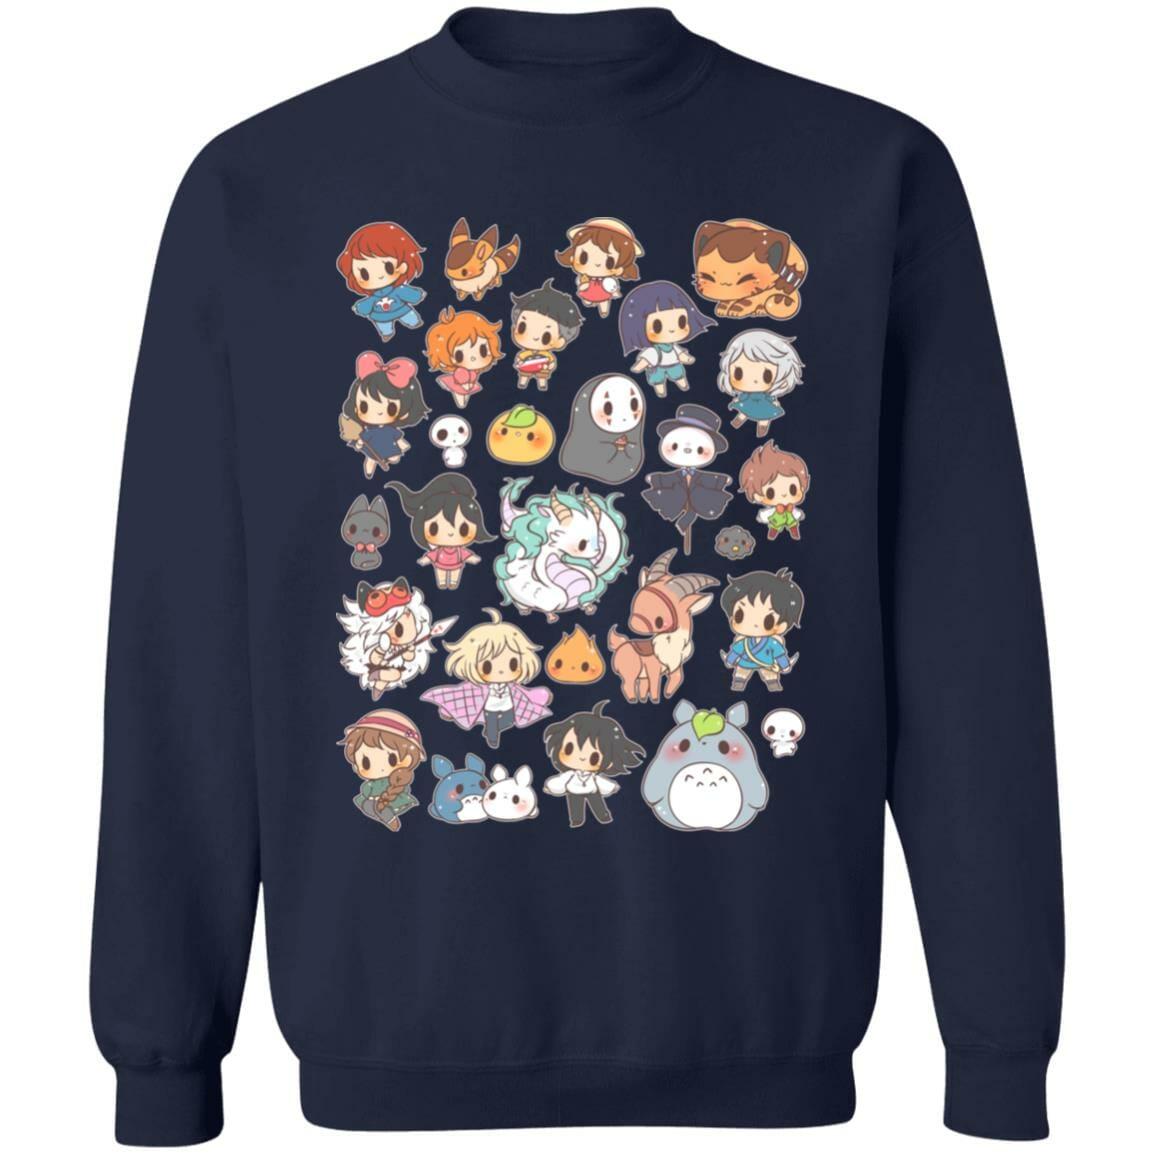 Ghibli Characters Cute Chibi Collection Sweatshirt